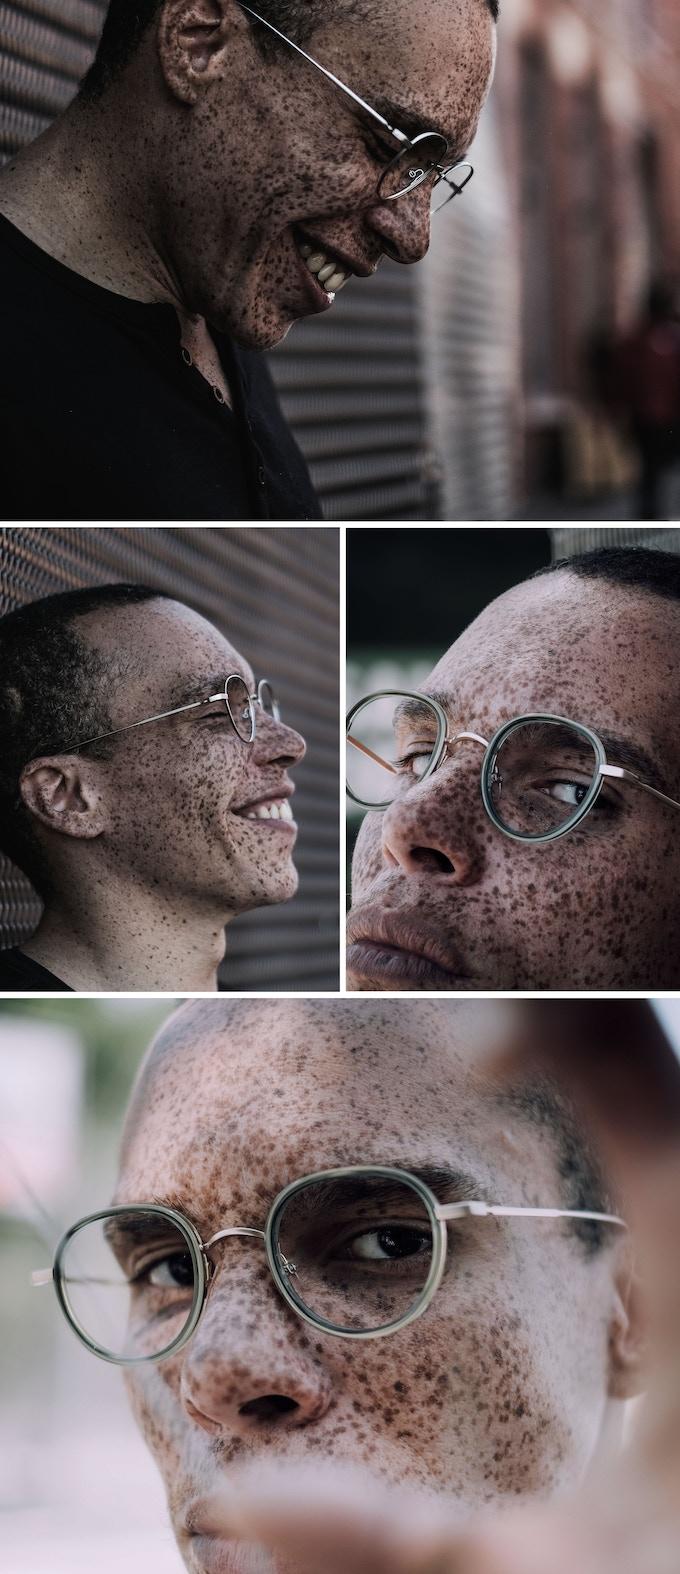 Glasses Model: Haussmann Smart Metal / Color: Matte Palladium - Glasses Model: Haussmann Ace&Steel / Color : Matte Green Transparent